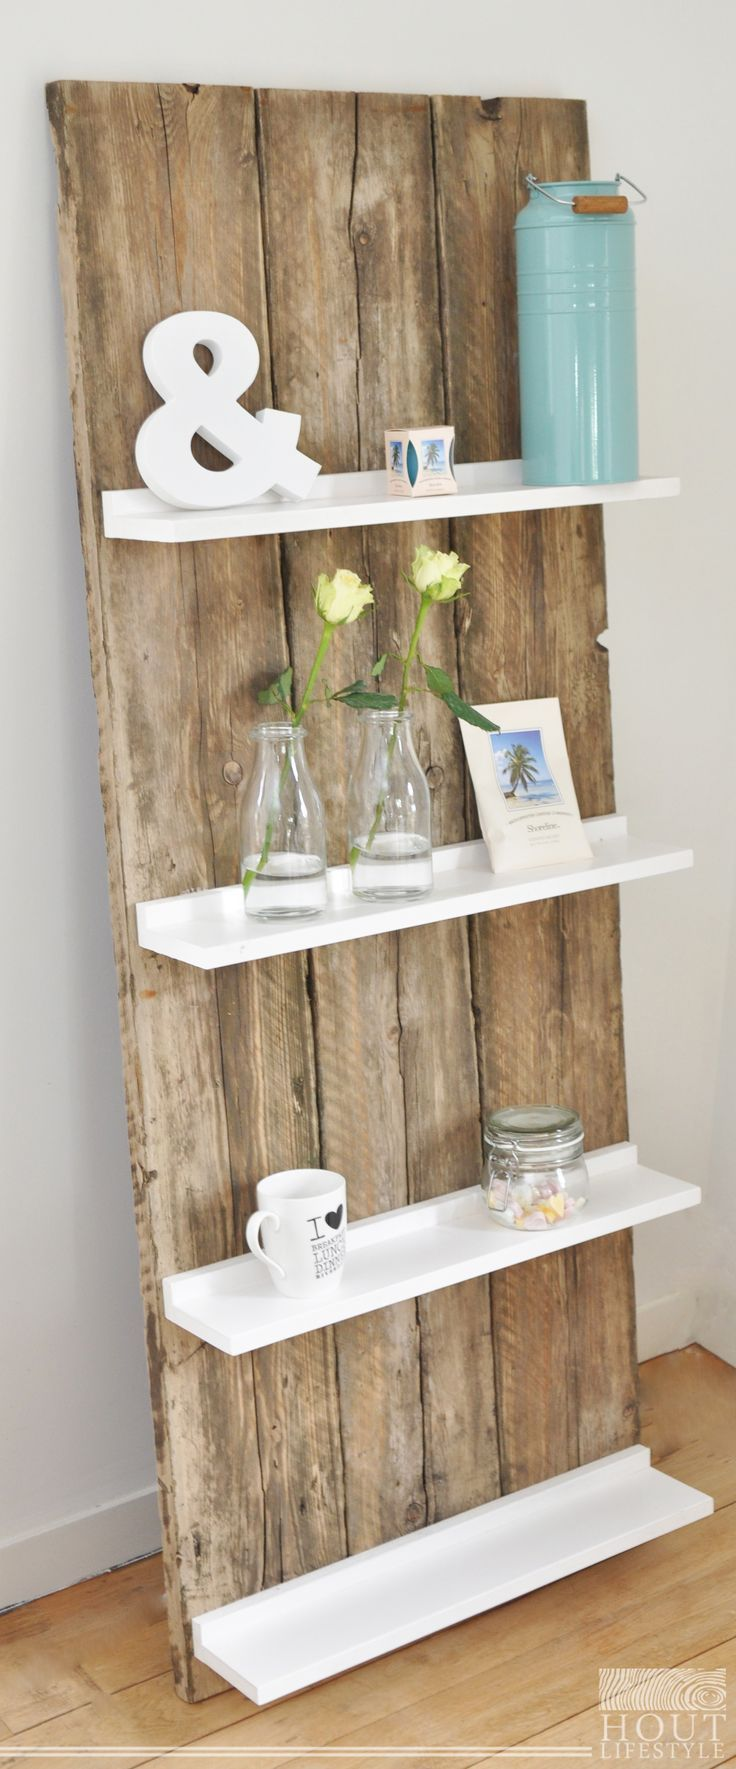 sch ne wandregale zum anlehnen paletten upcycling auch. Black Bedroom Furniture Sets. Home Design Ideas